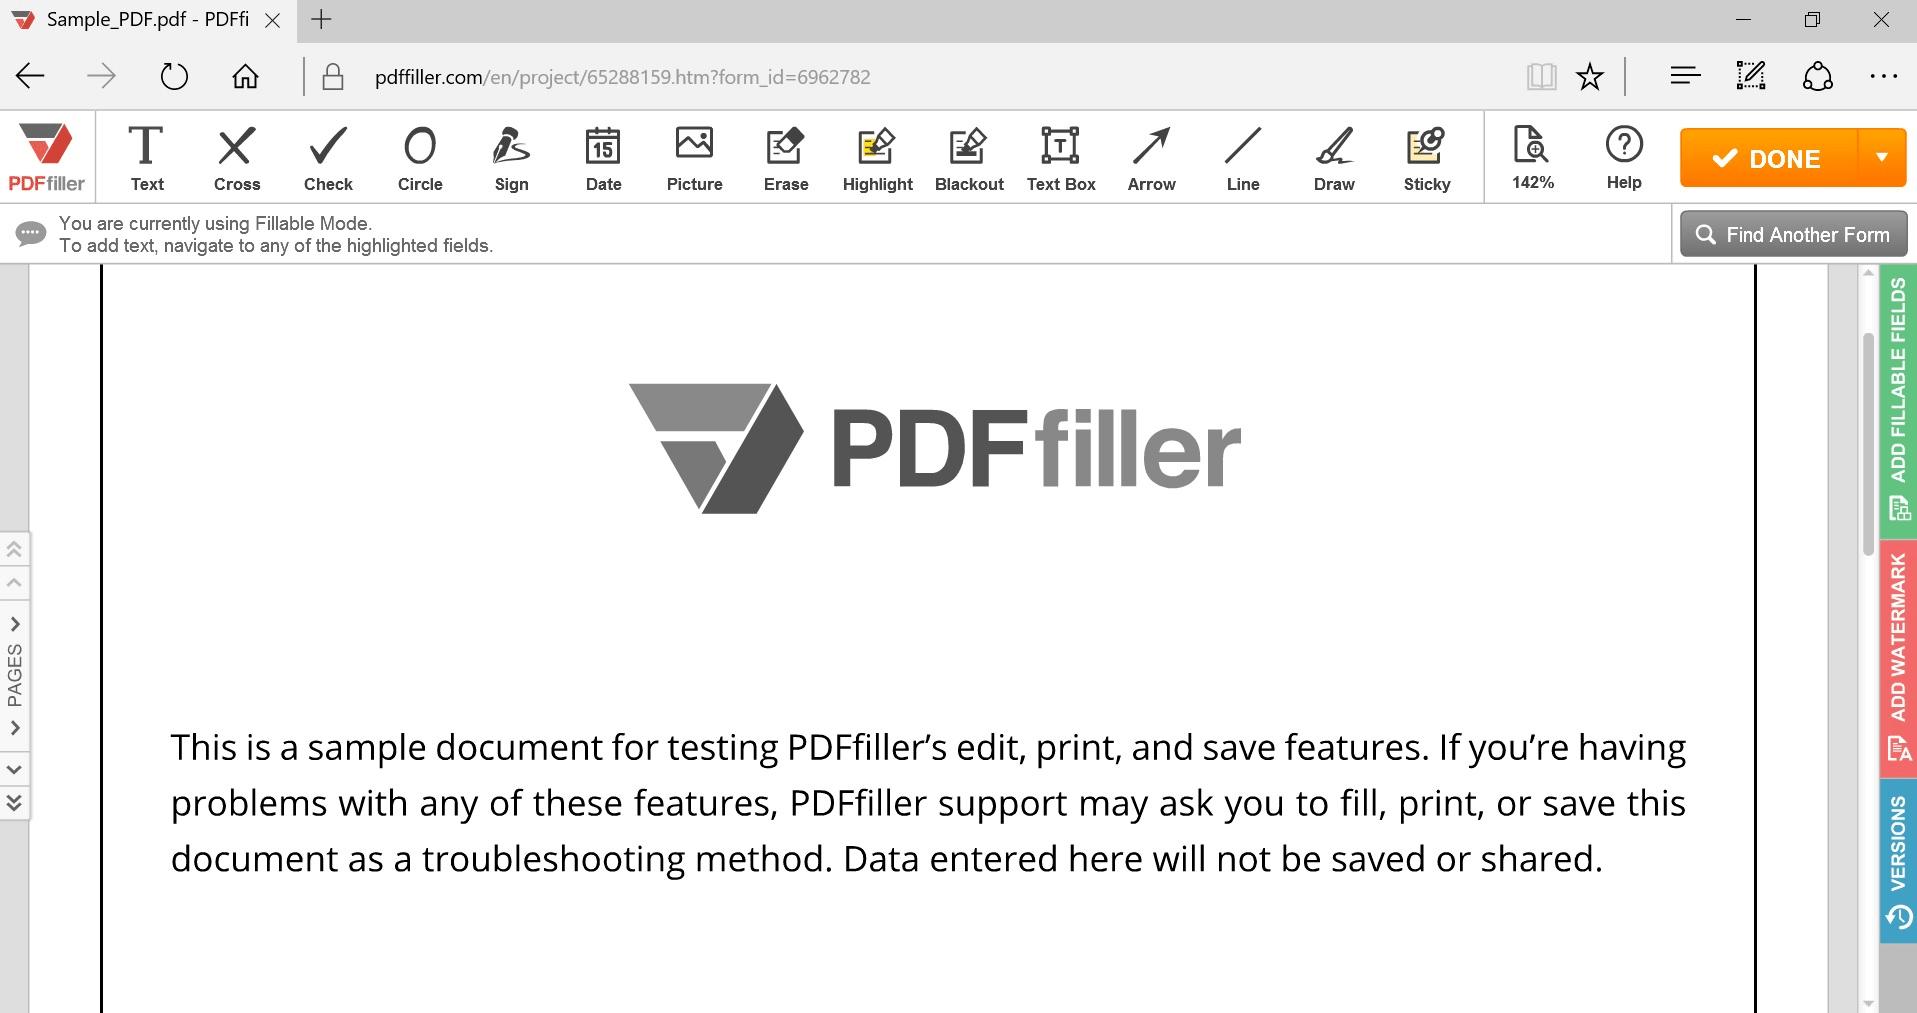 Sample Pdf File For Testing